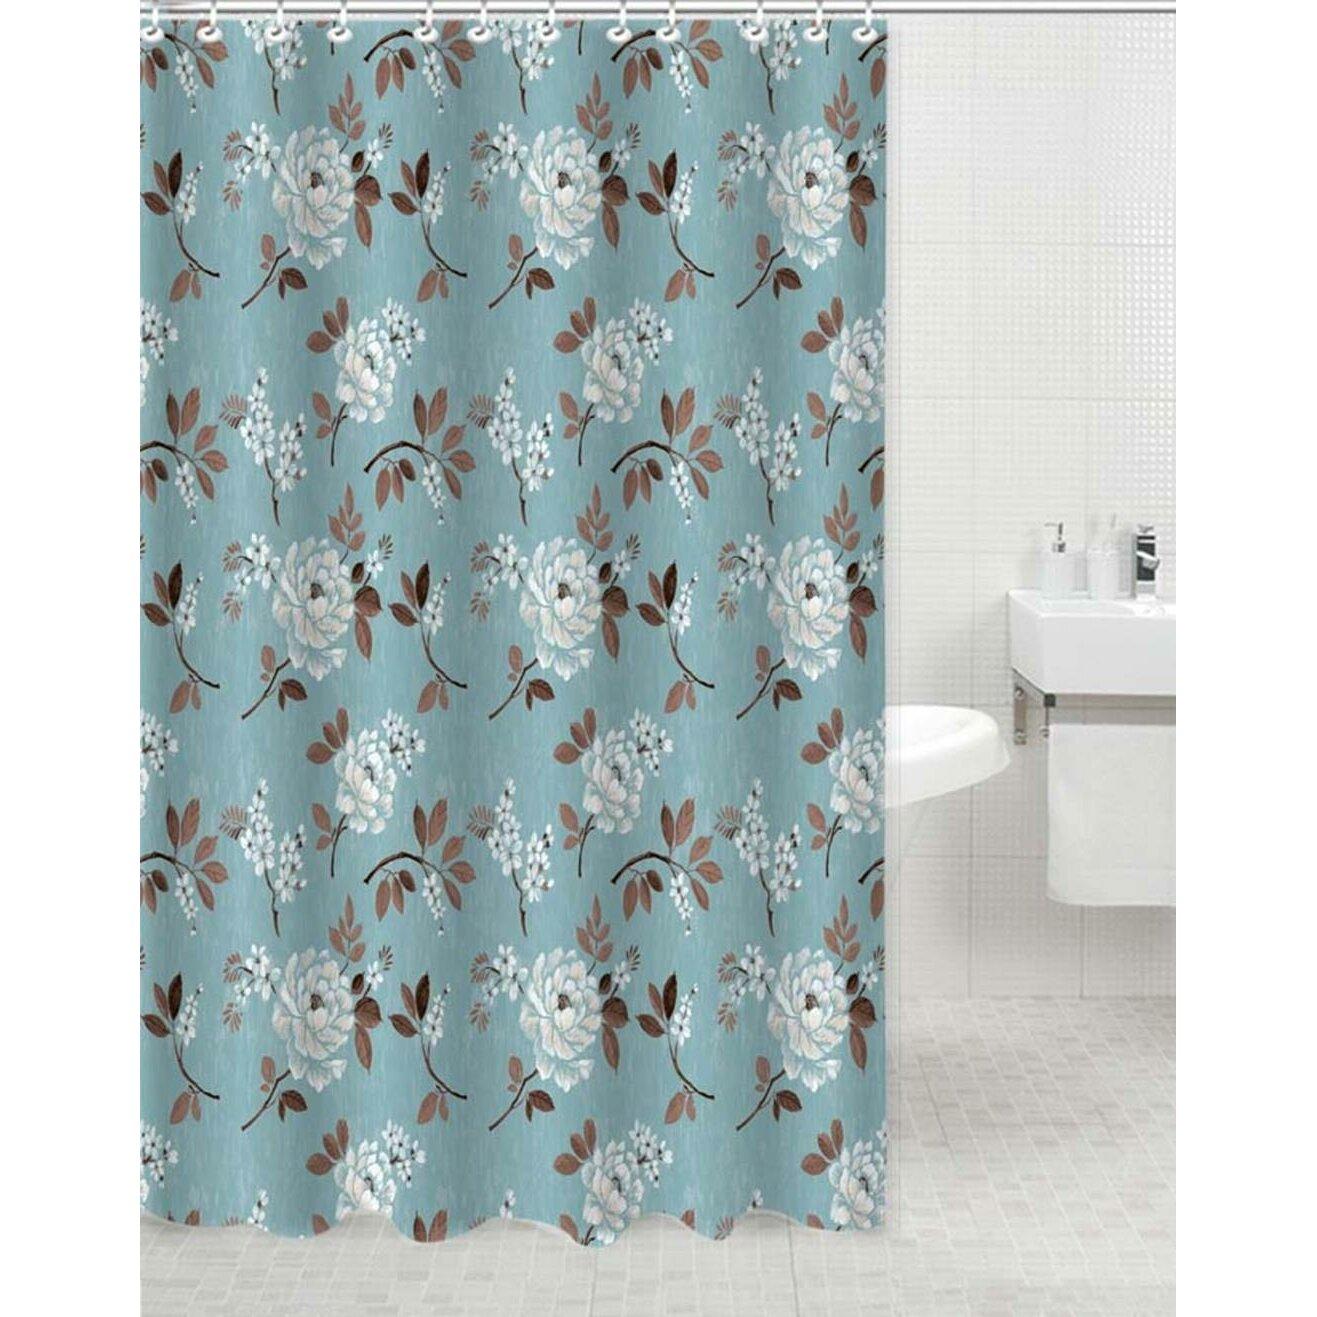 Daniels Bath Floral Polyester Shower Curtain Reviews